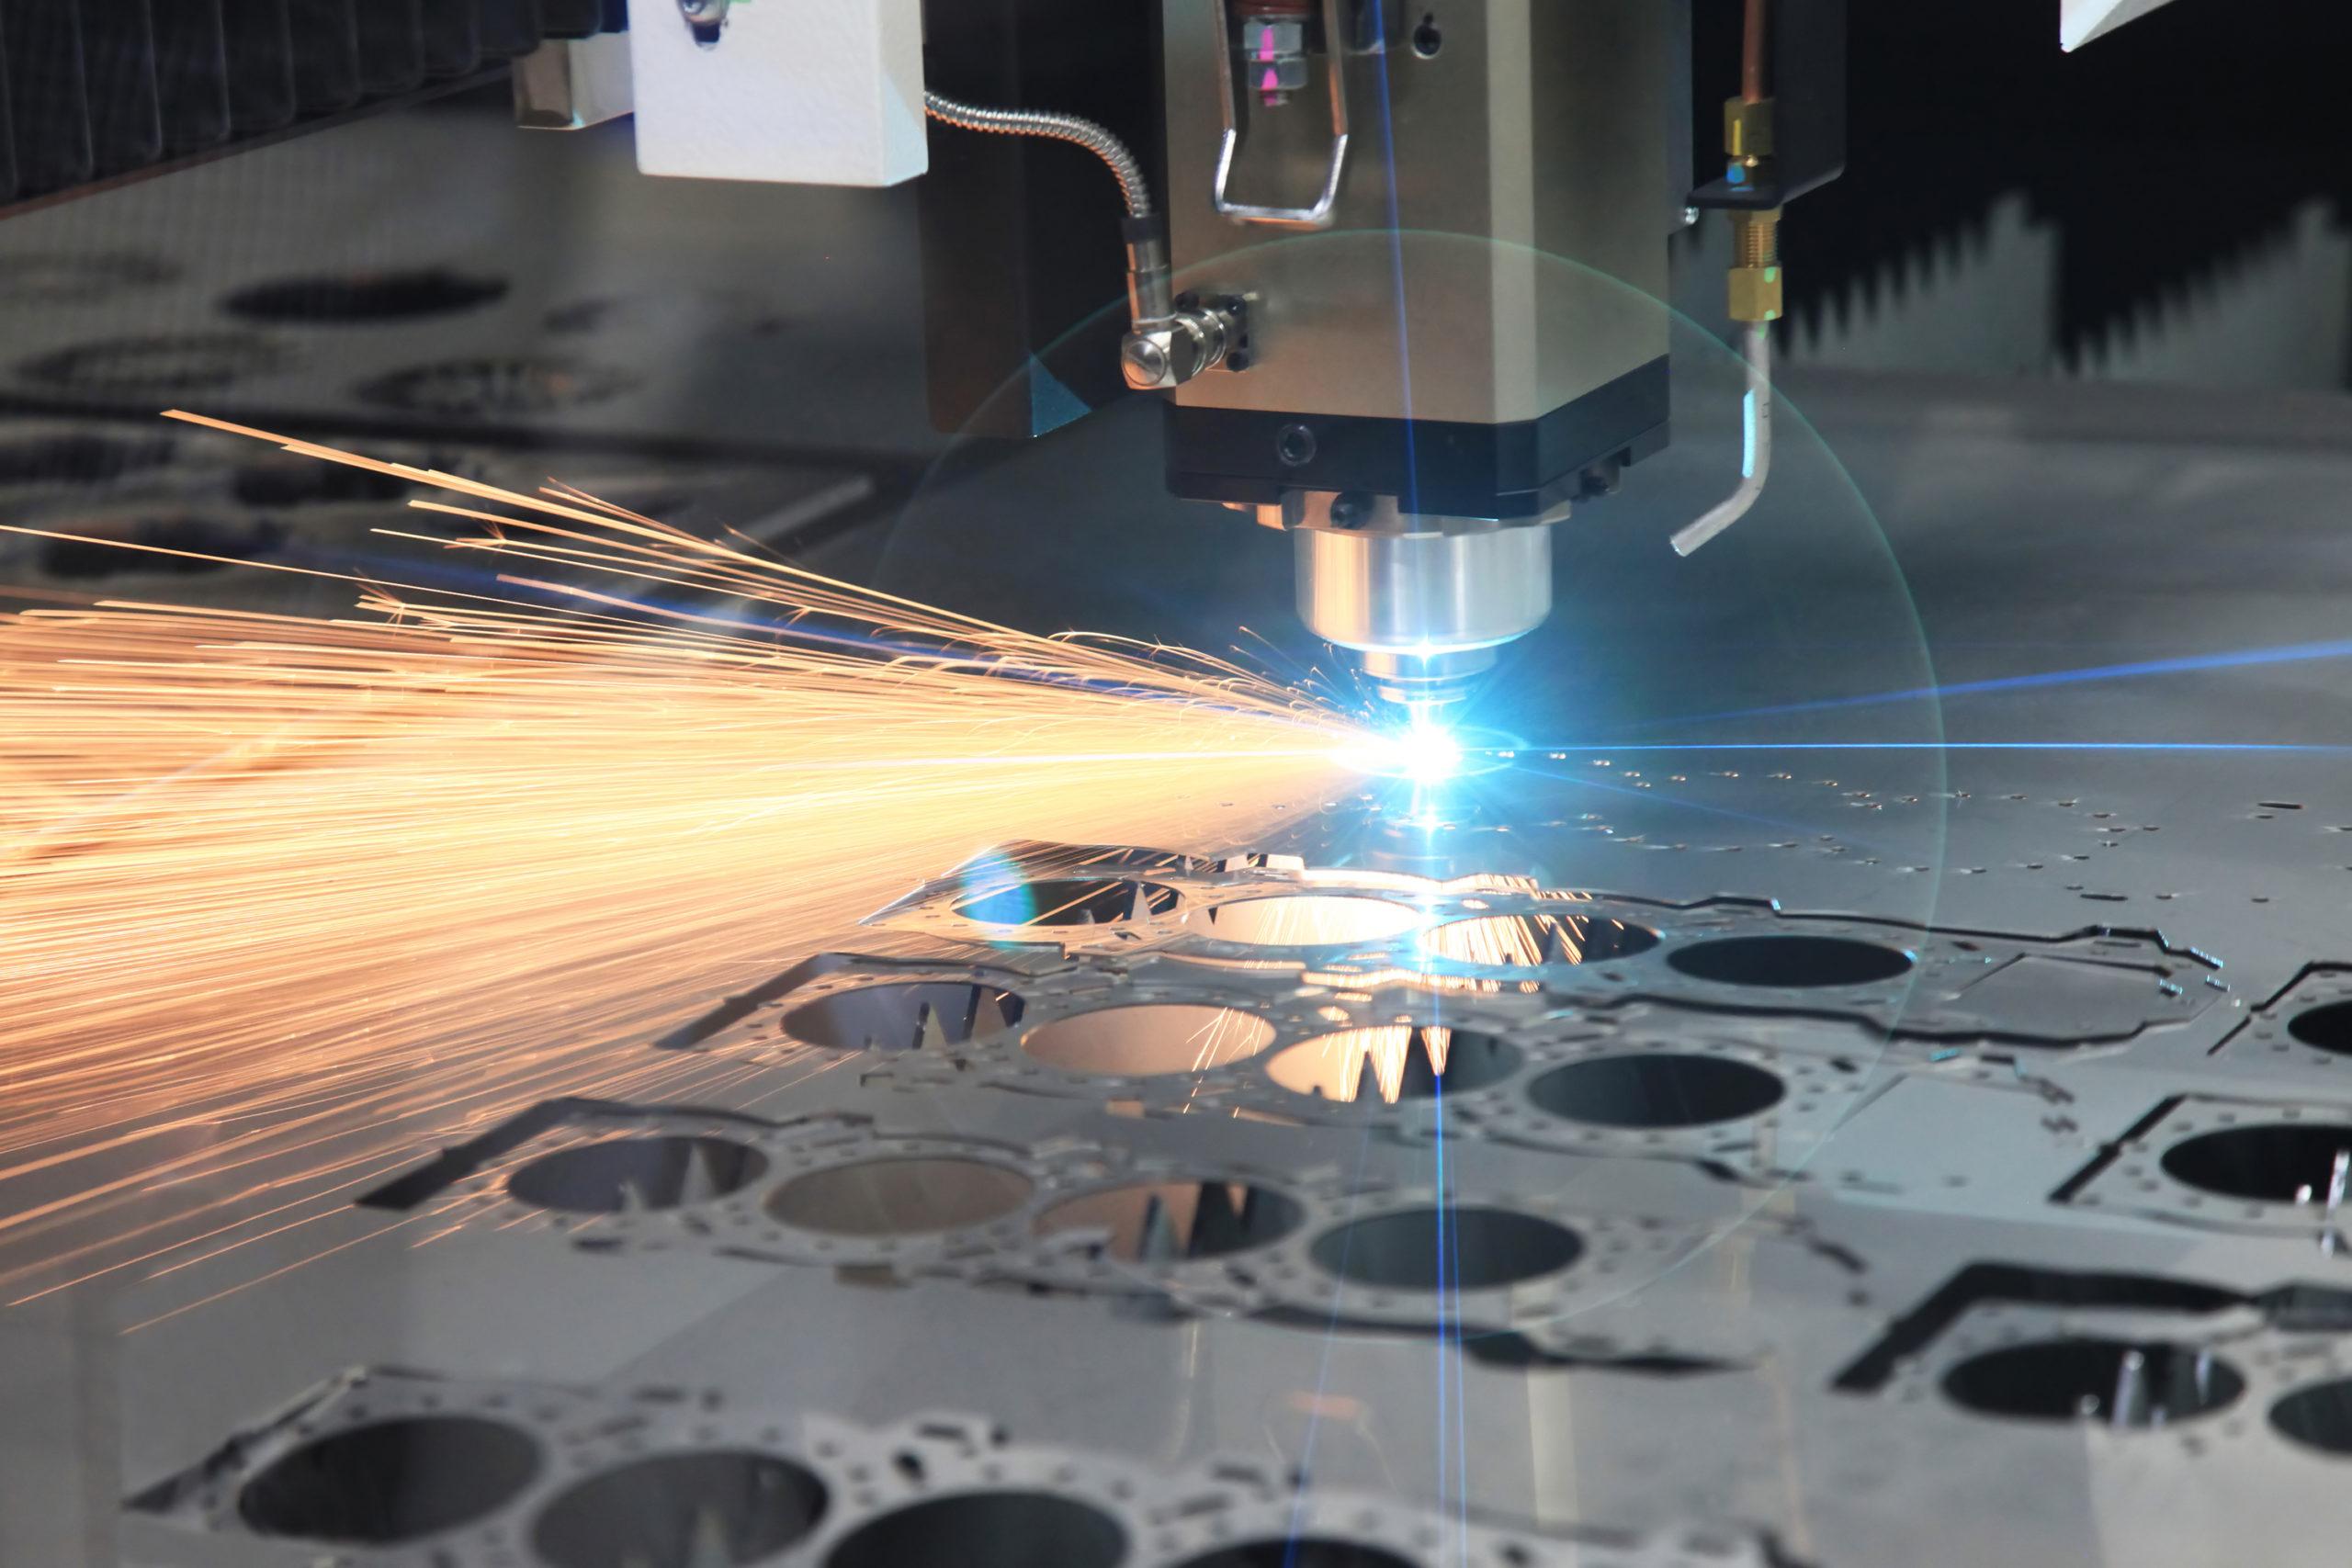 Laserbearbeitung, Laserschneiden